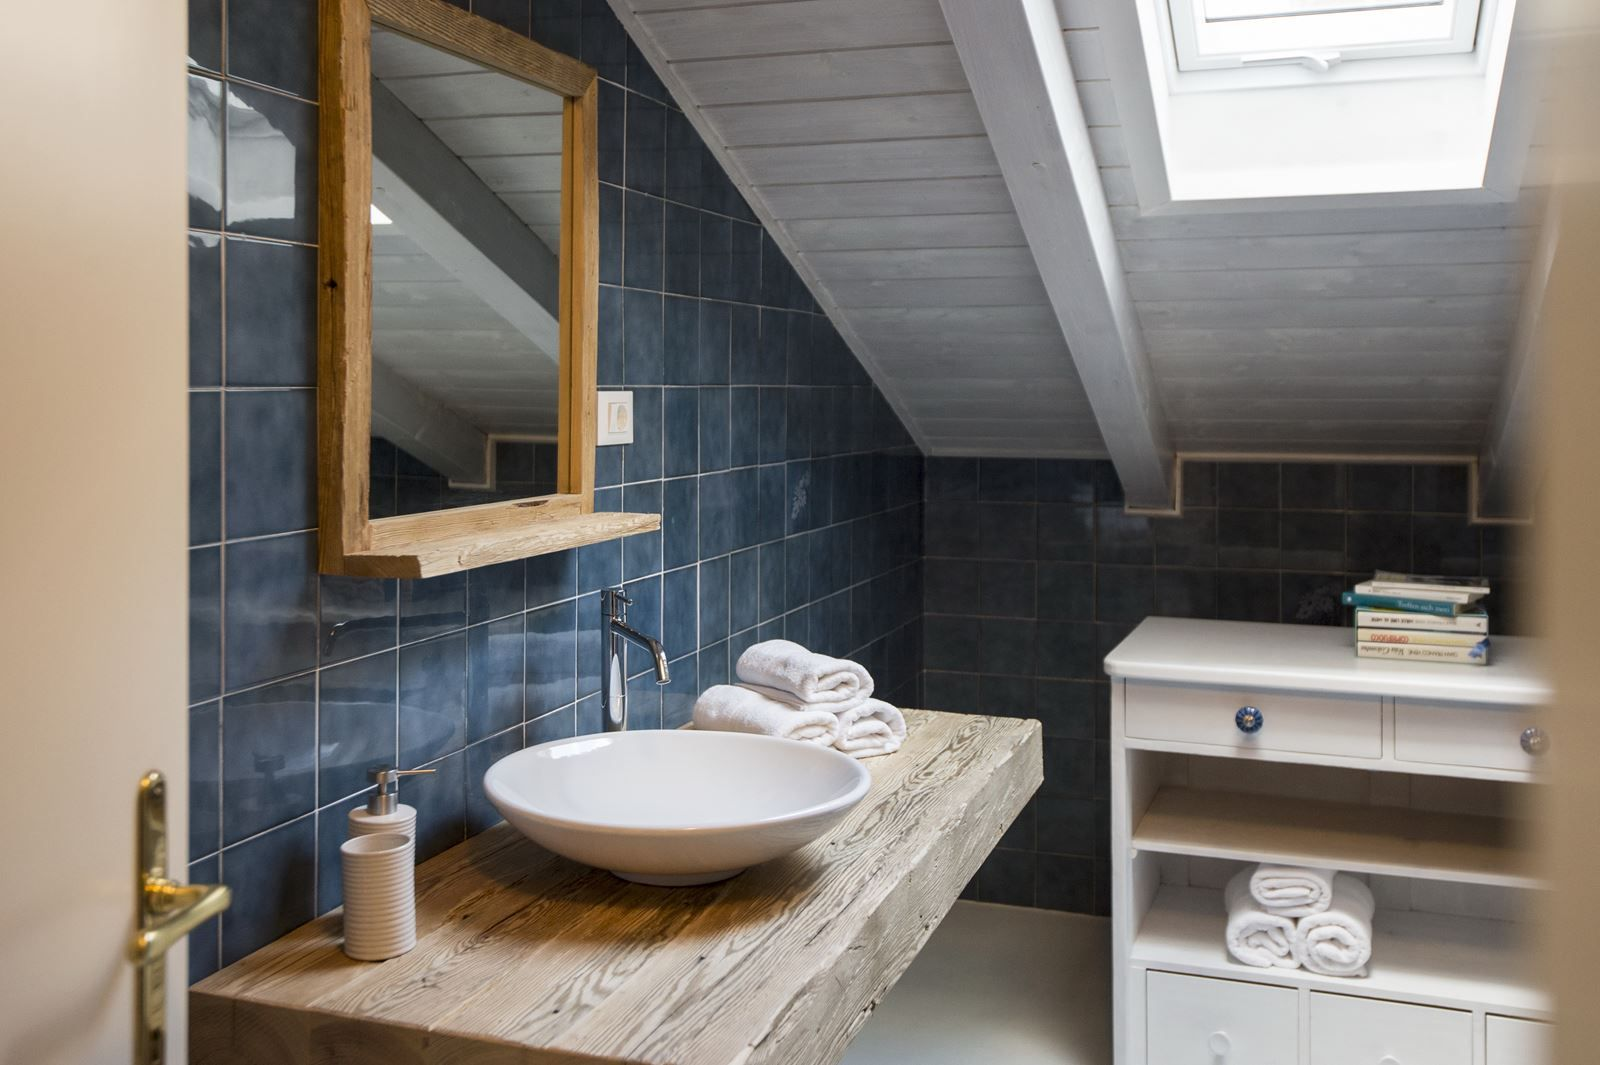 Bagno mansarda ~ Una mansarda per le vacanze in montagna attic attic